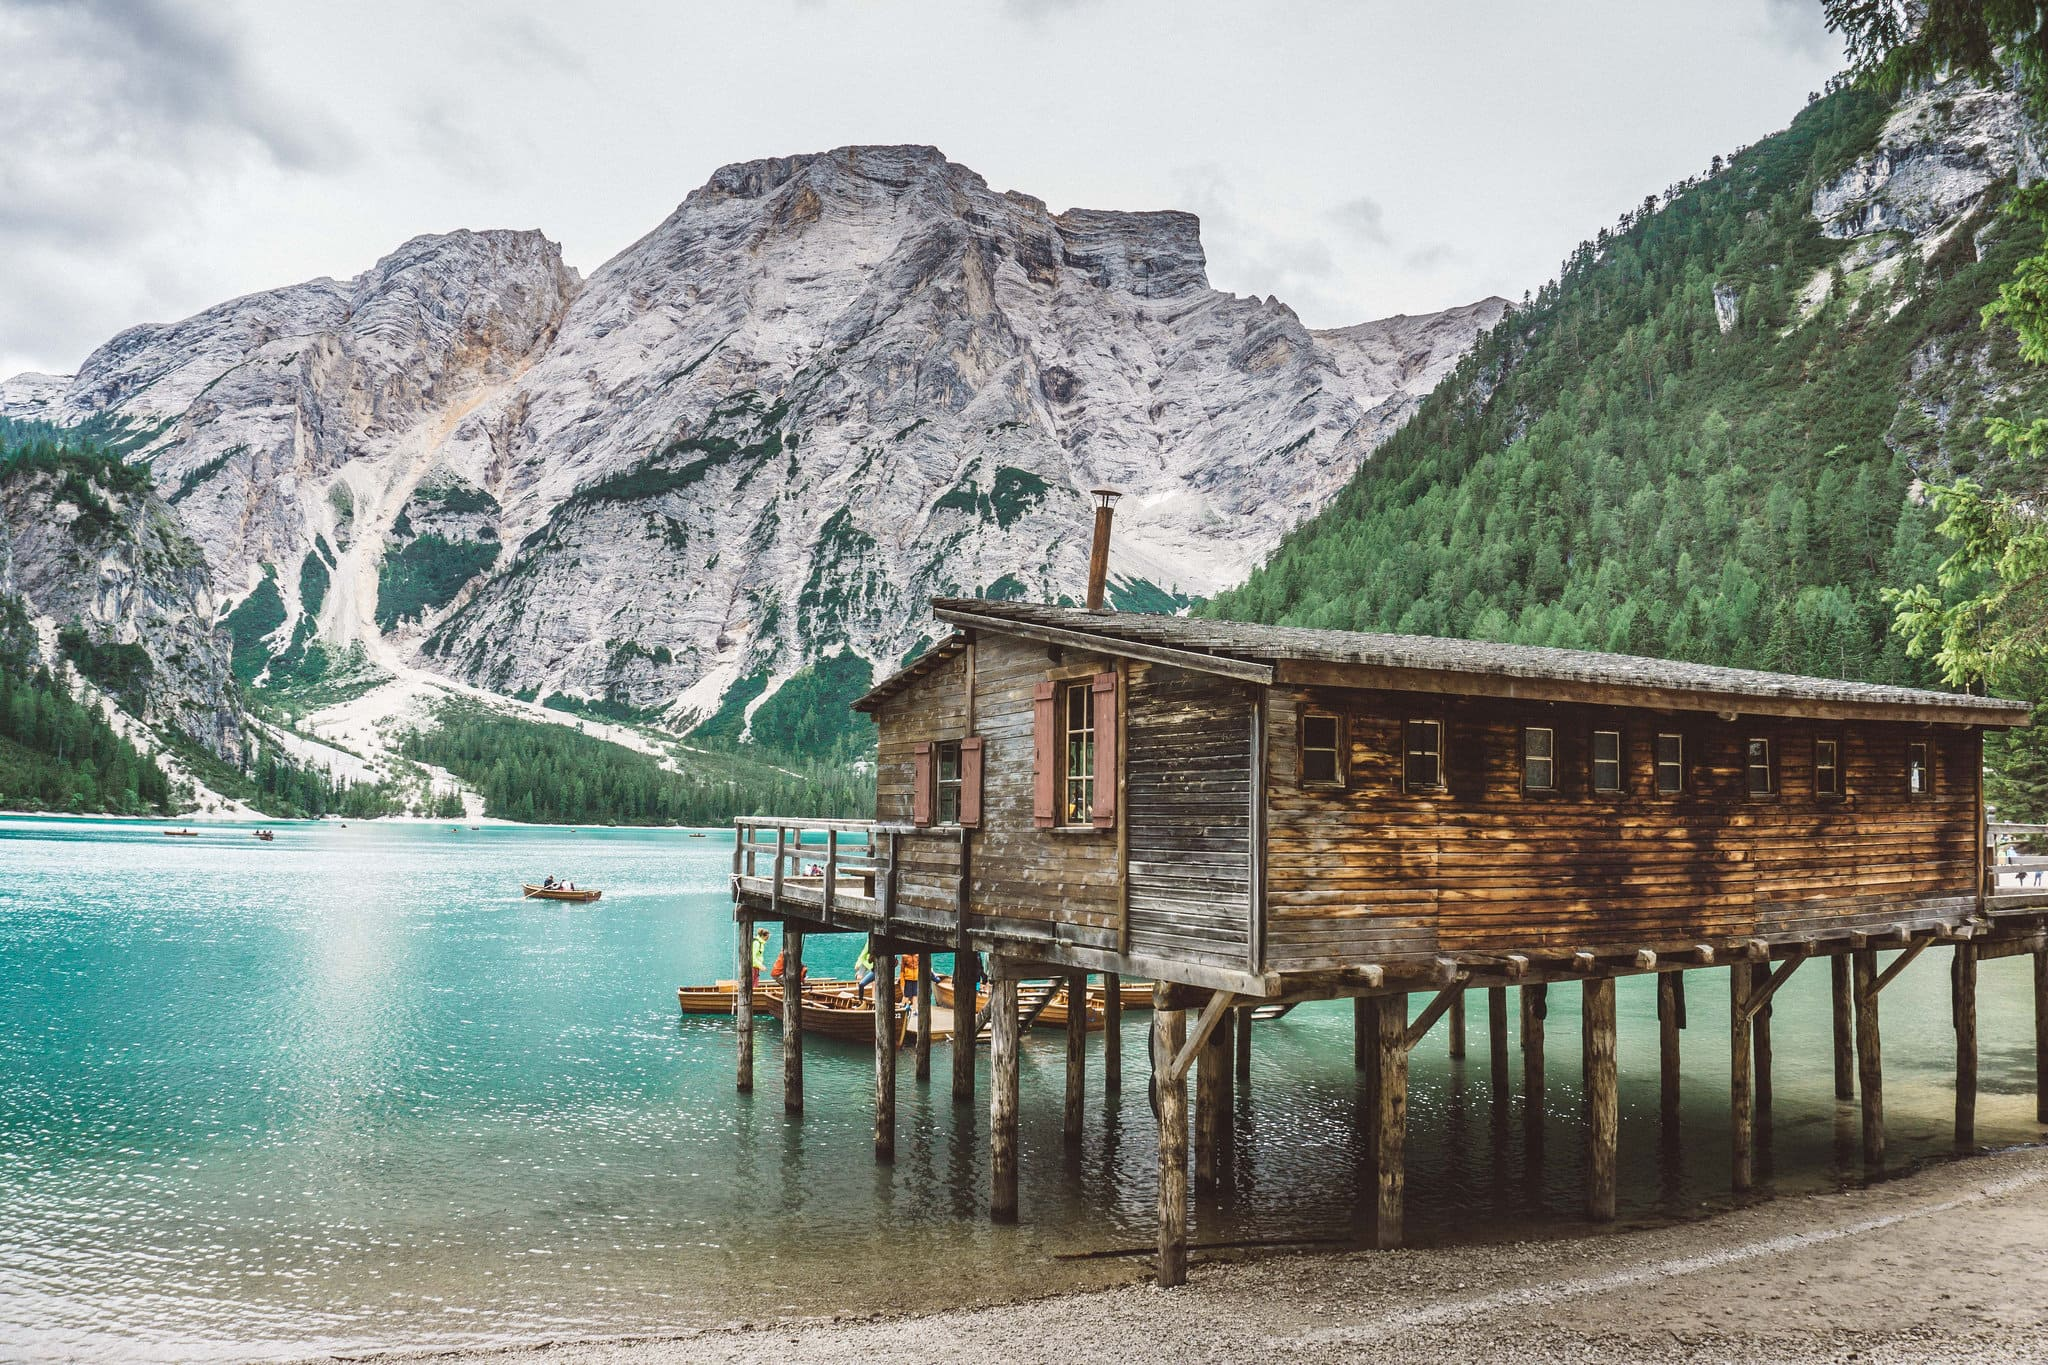 laghi dell'alto adige - Braies